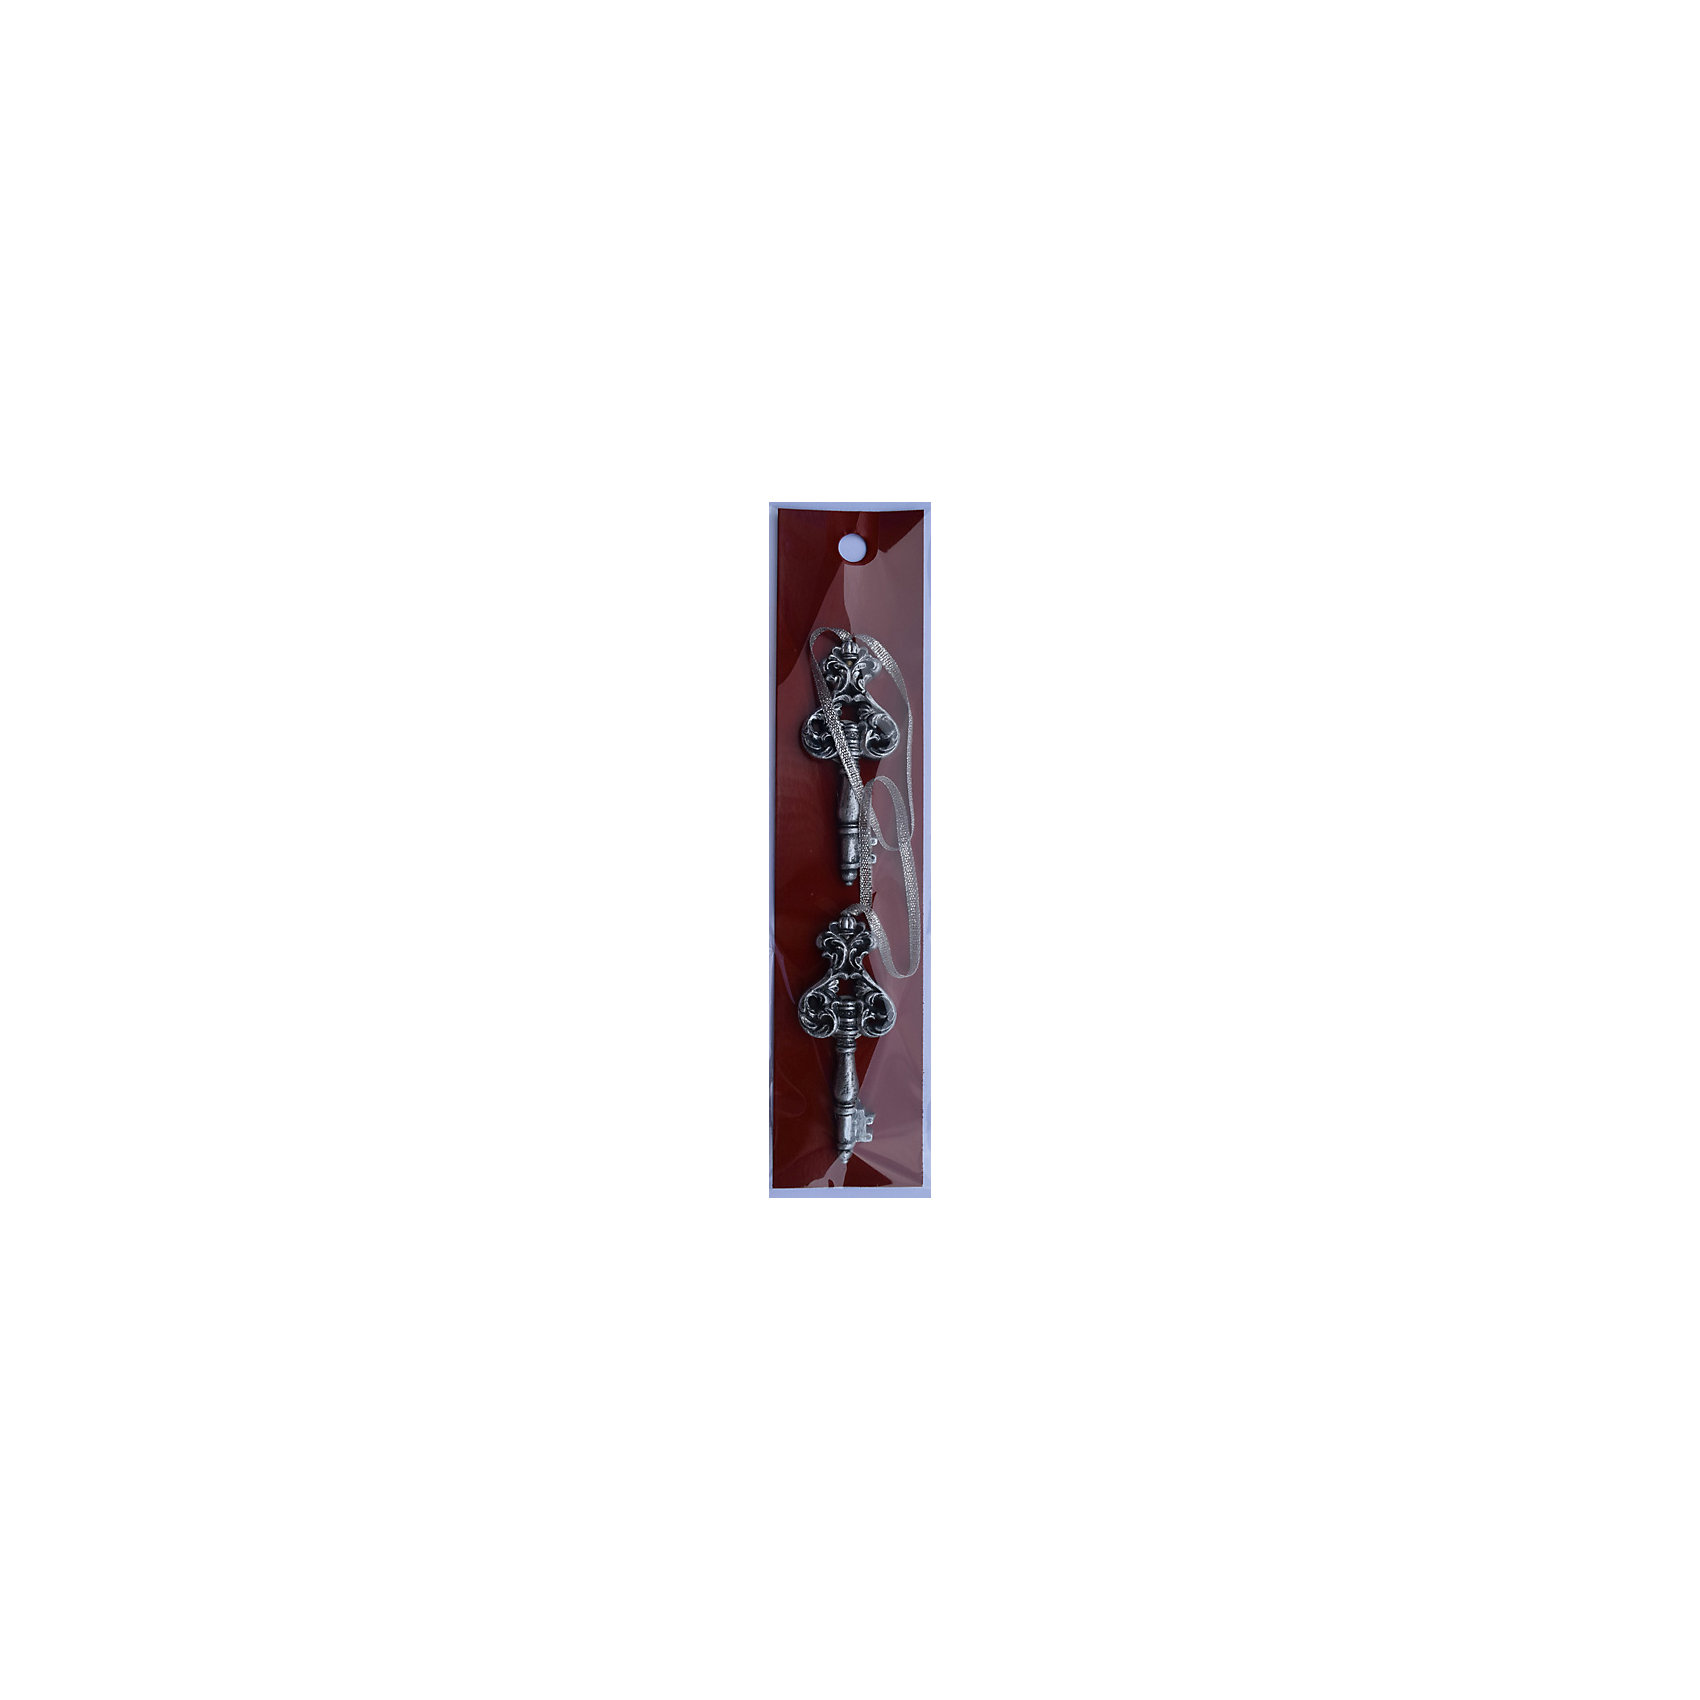 Magic Time Набор украшений Ажурные ключи 2 шт magic time набор украшений королевские ключи 2 шт